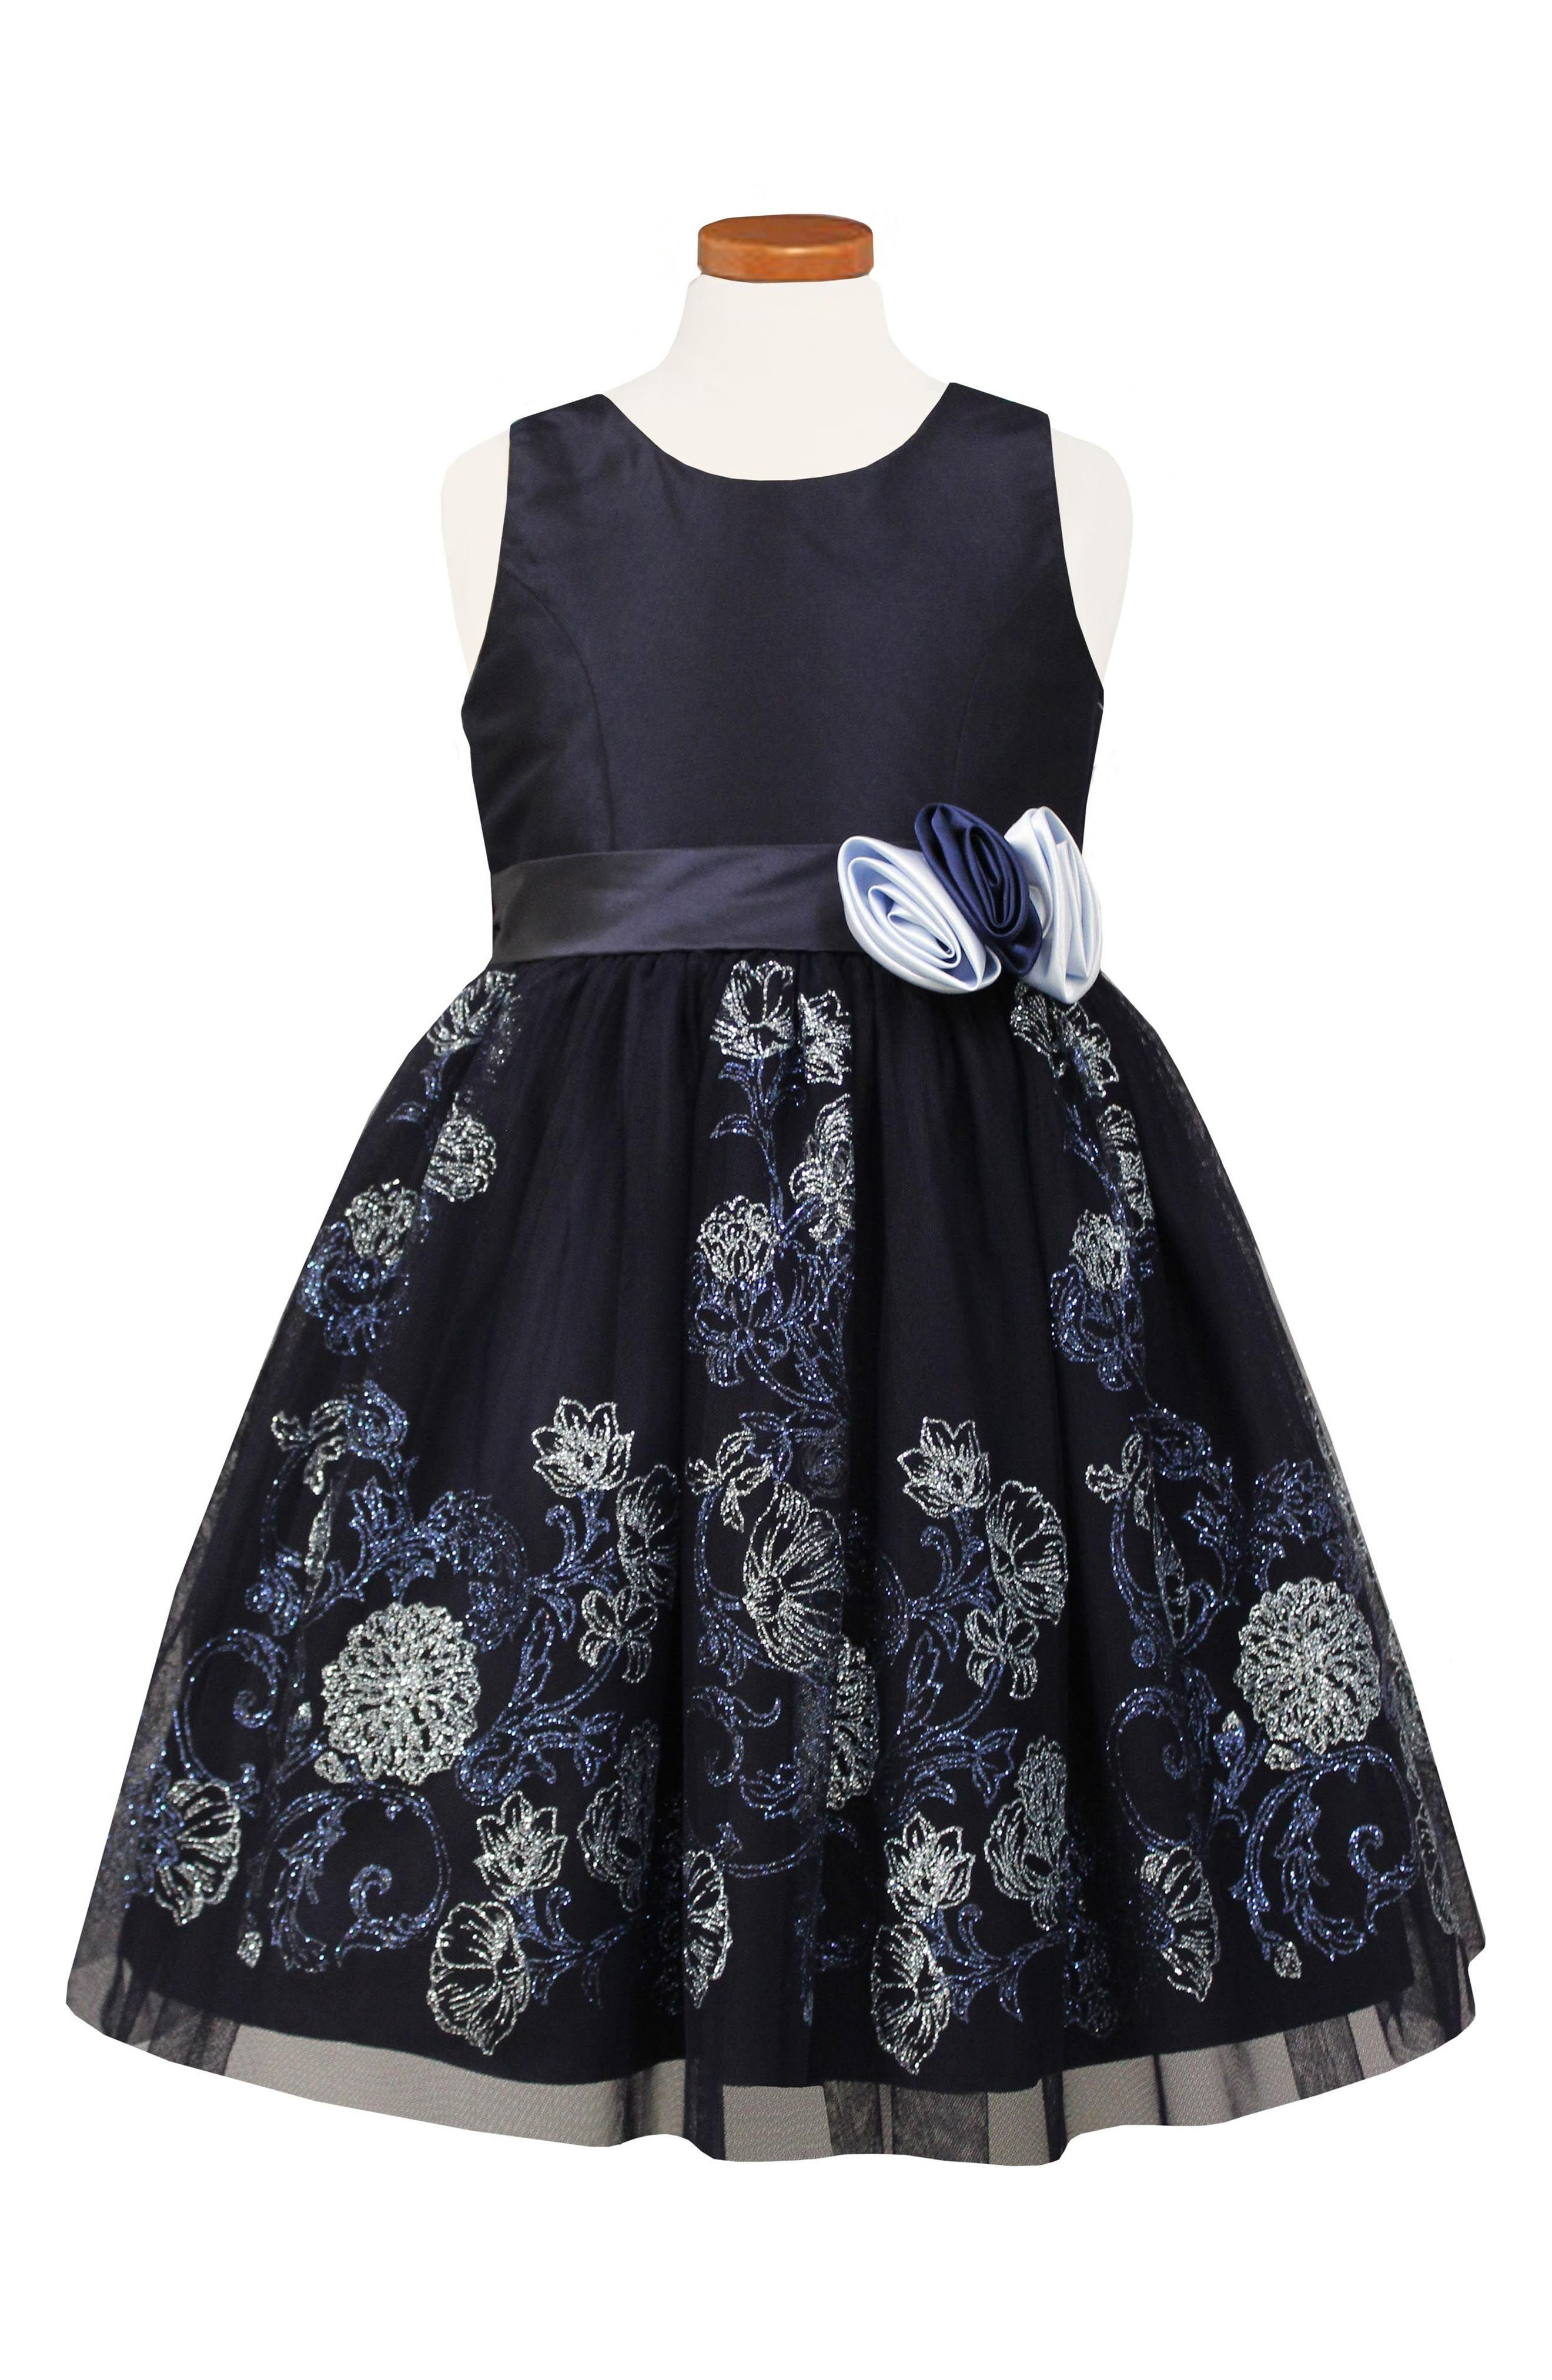 Main Image - Sorbet Glitter Embellished Party Dress (Toddler Girls & Little Girls)